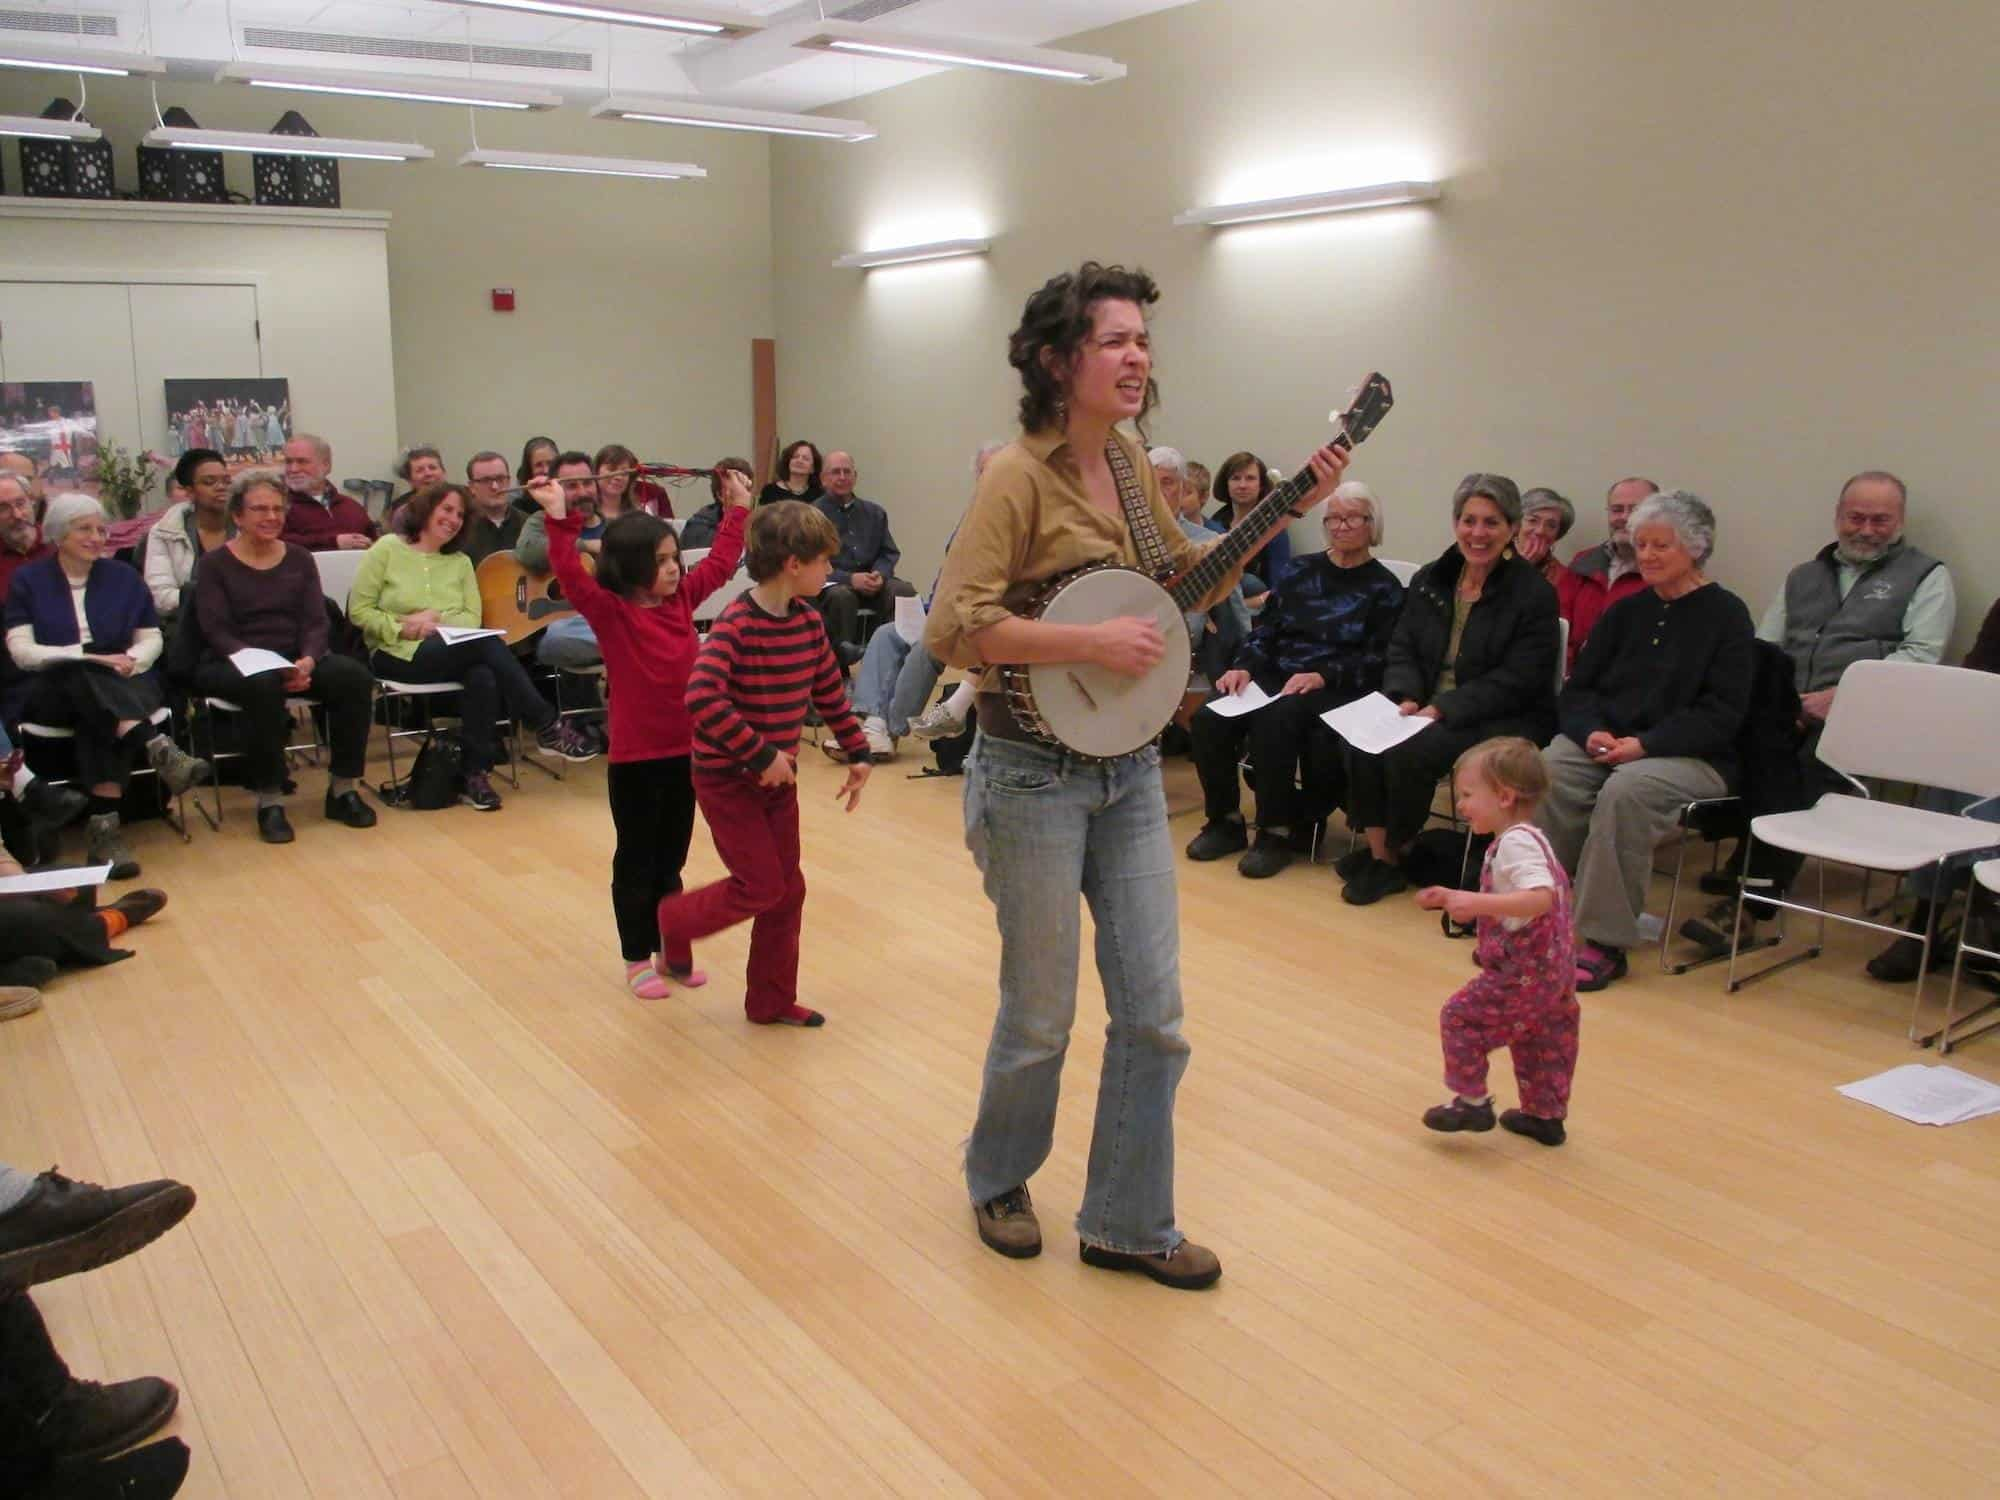 Carpe Diem-Revels Family Community Sing